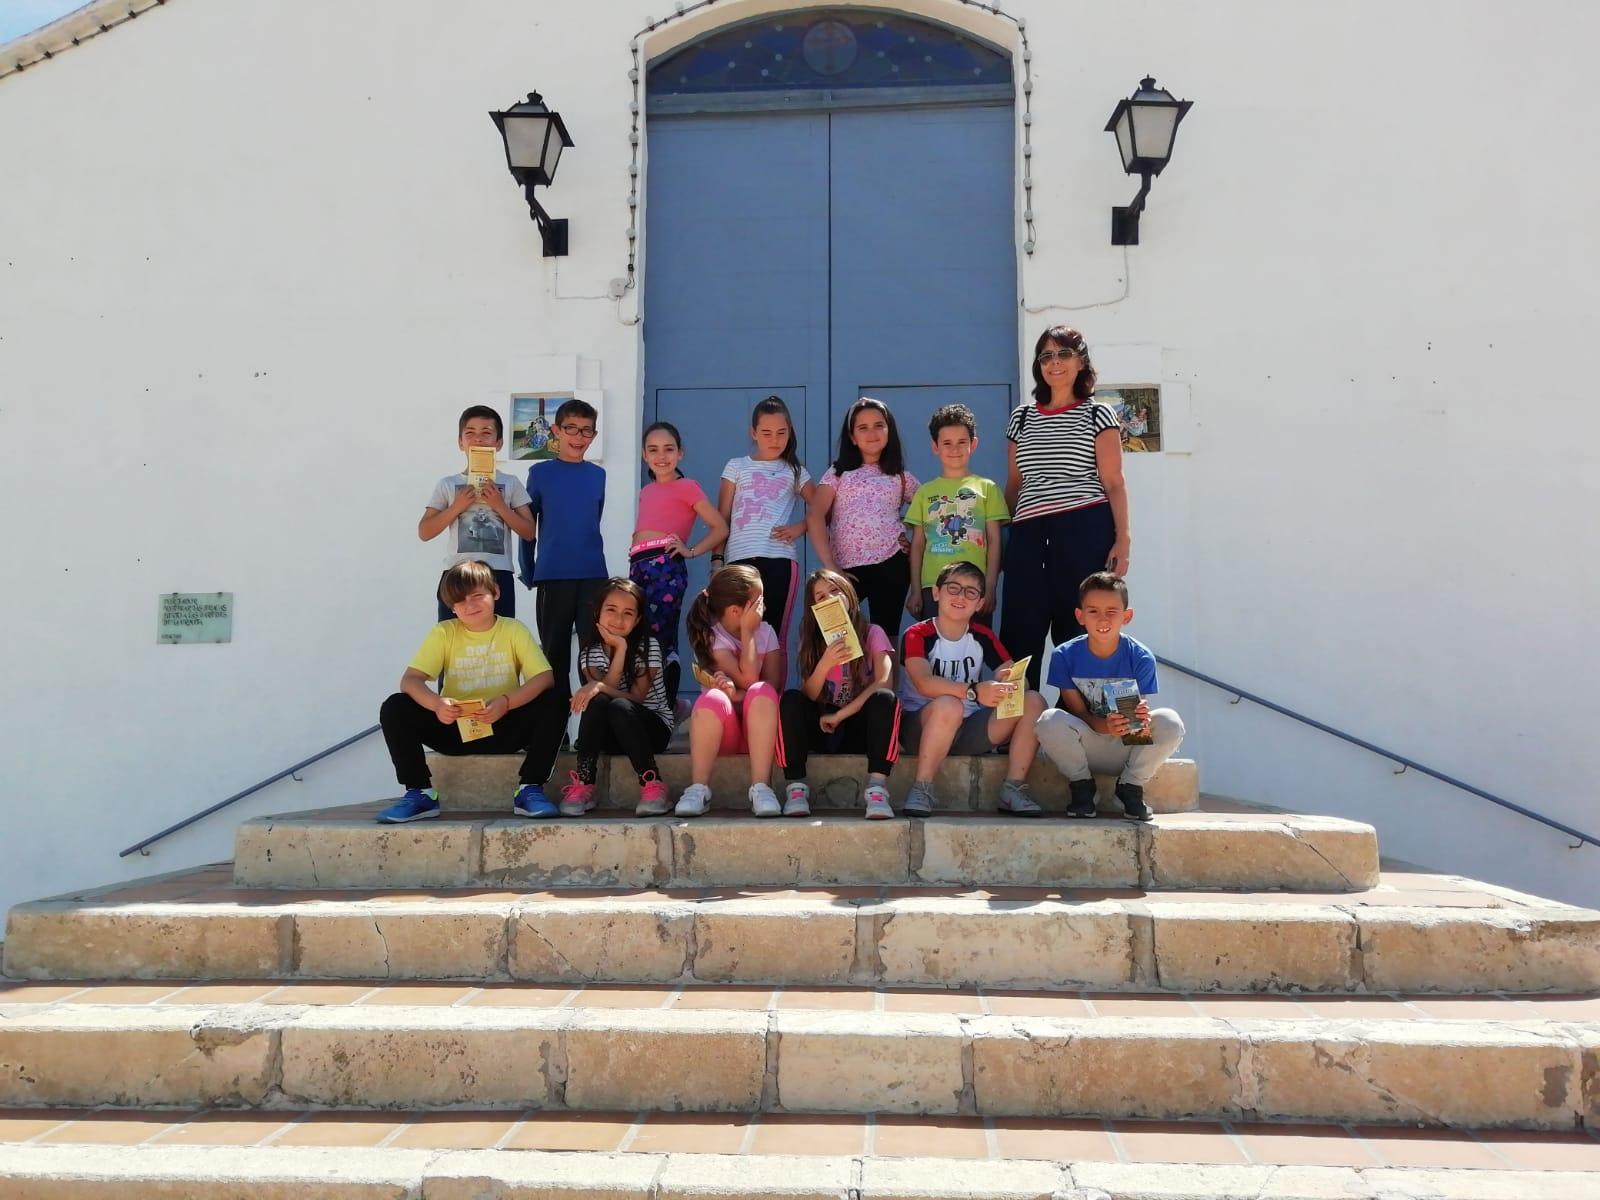 (2019-05-23) Visita ermita alumnos Laura - 3 C primaria - Reina Sofia - María Isabel Berenguer (02)